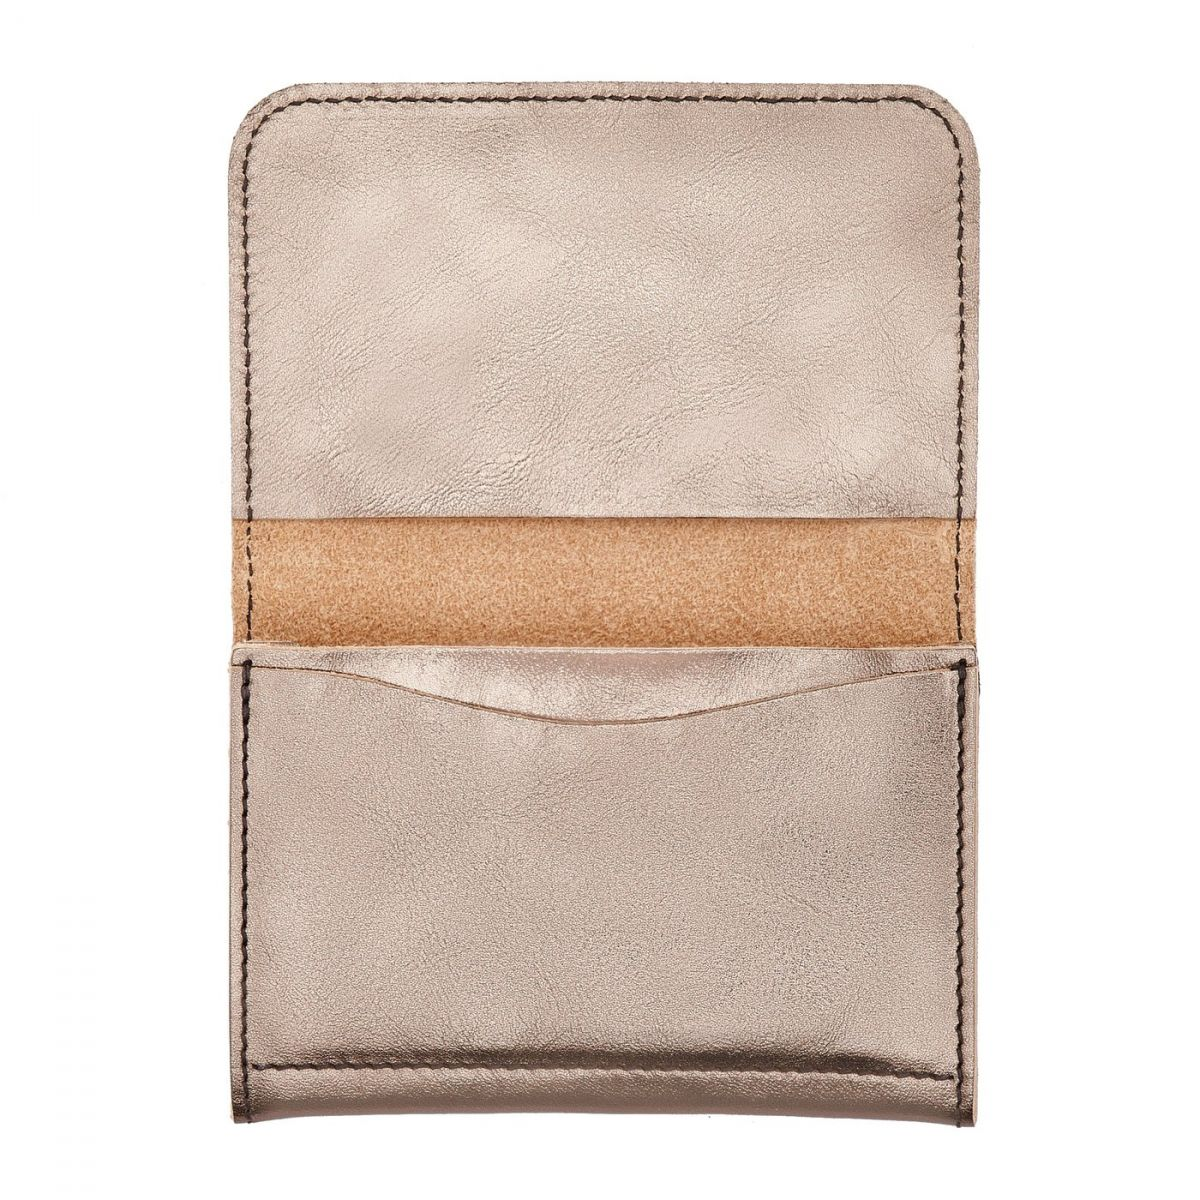 Card Case in Metallic Leather SCC004 color Metallic Bronze | Details